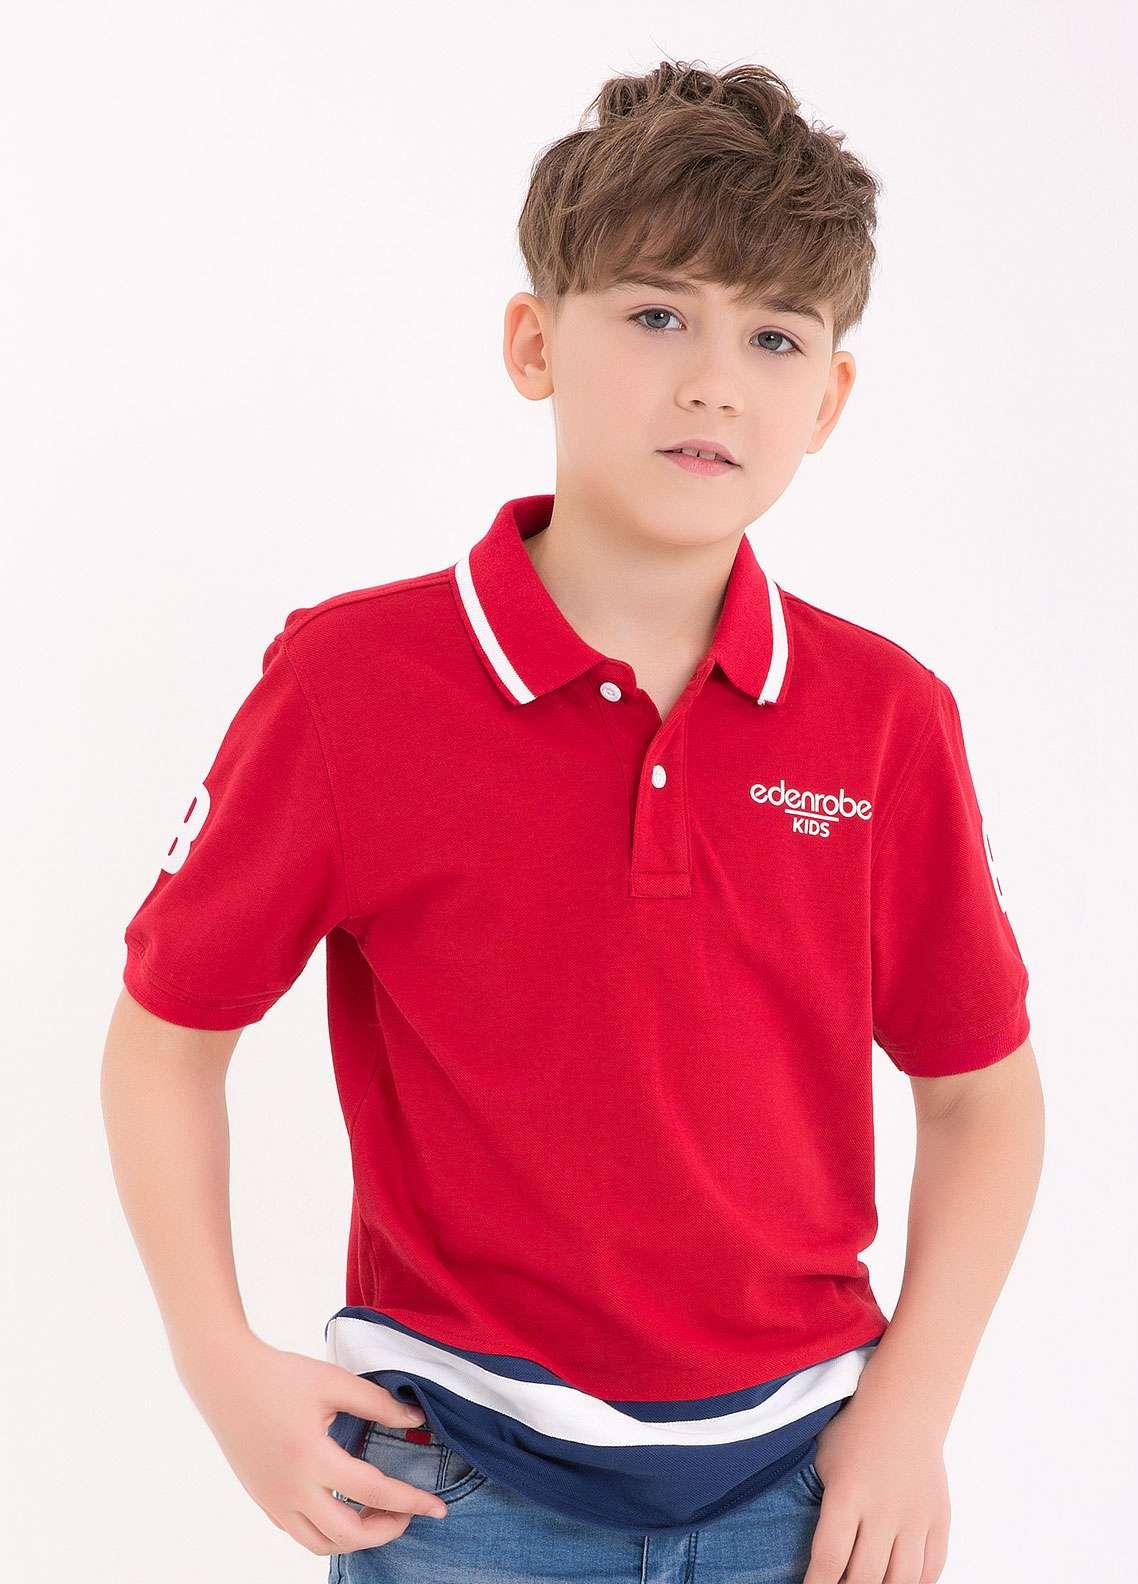 Edenrobe Cotton Polo Boys Shirts - Red EDK18PS 004